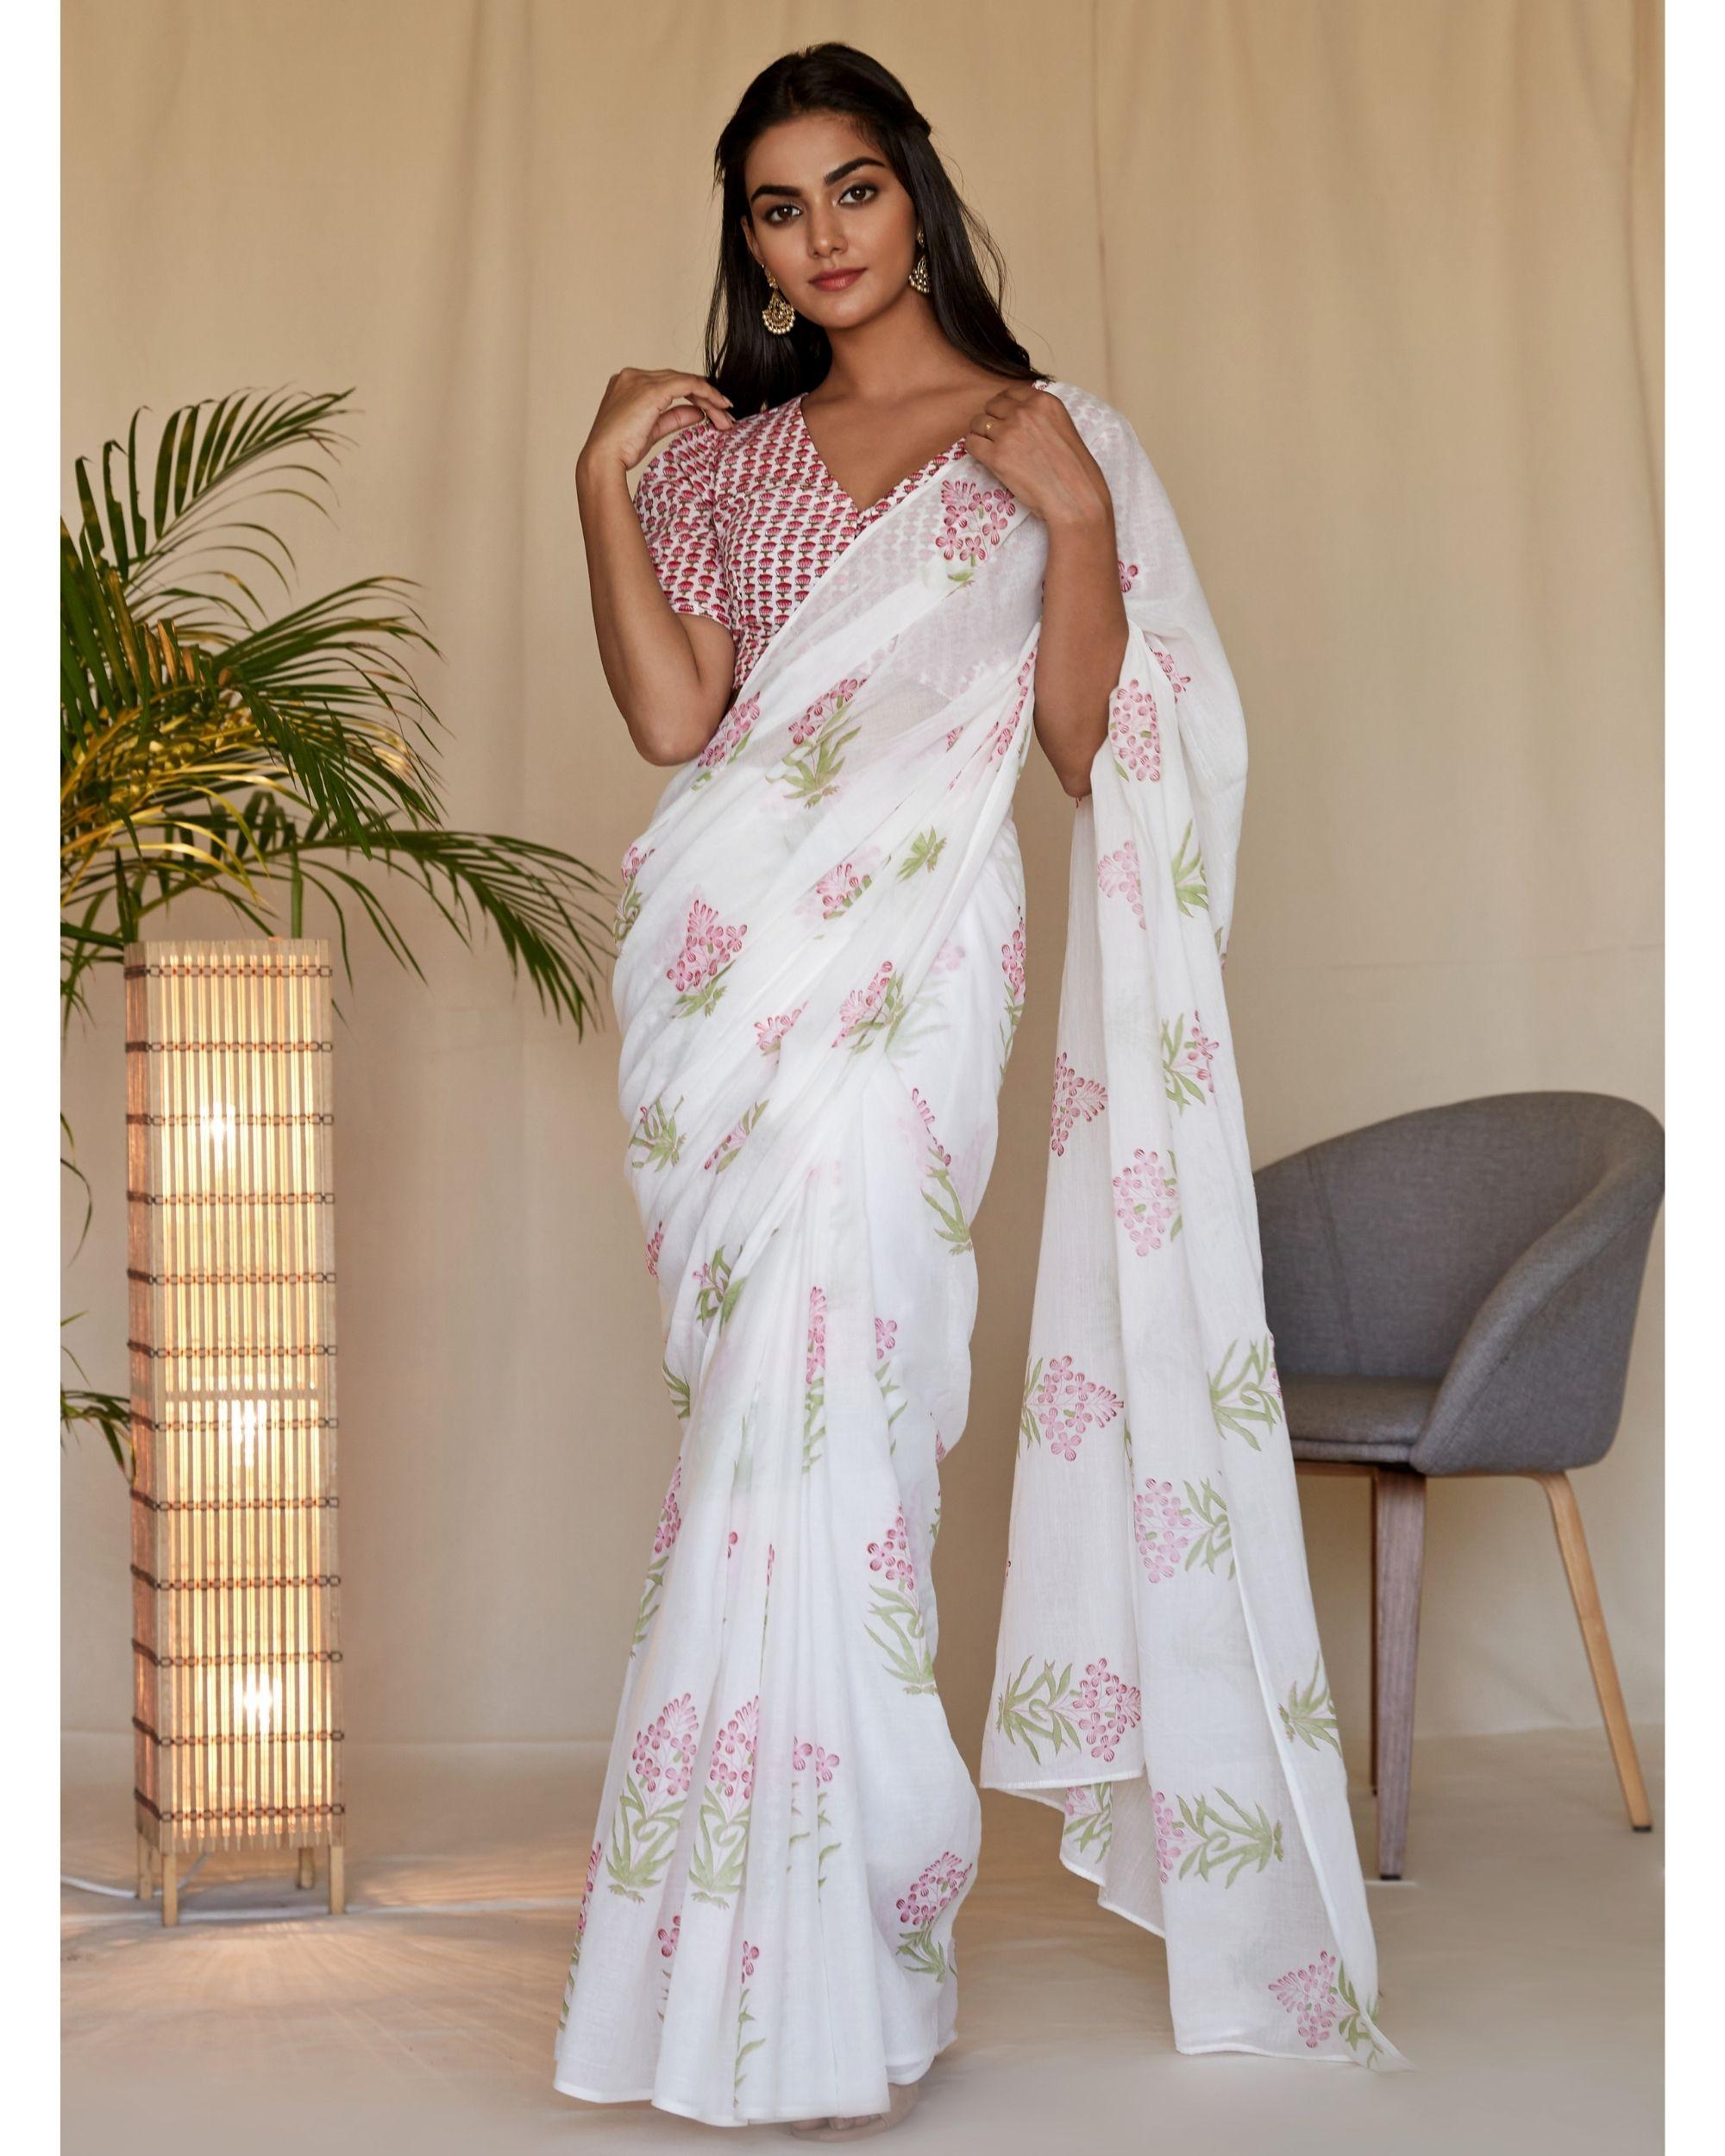 Pink cherry blossom block printed sari